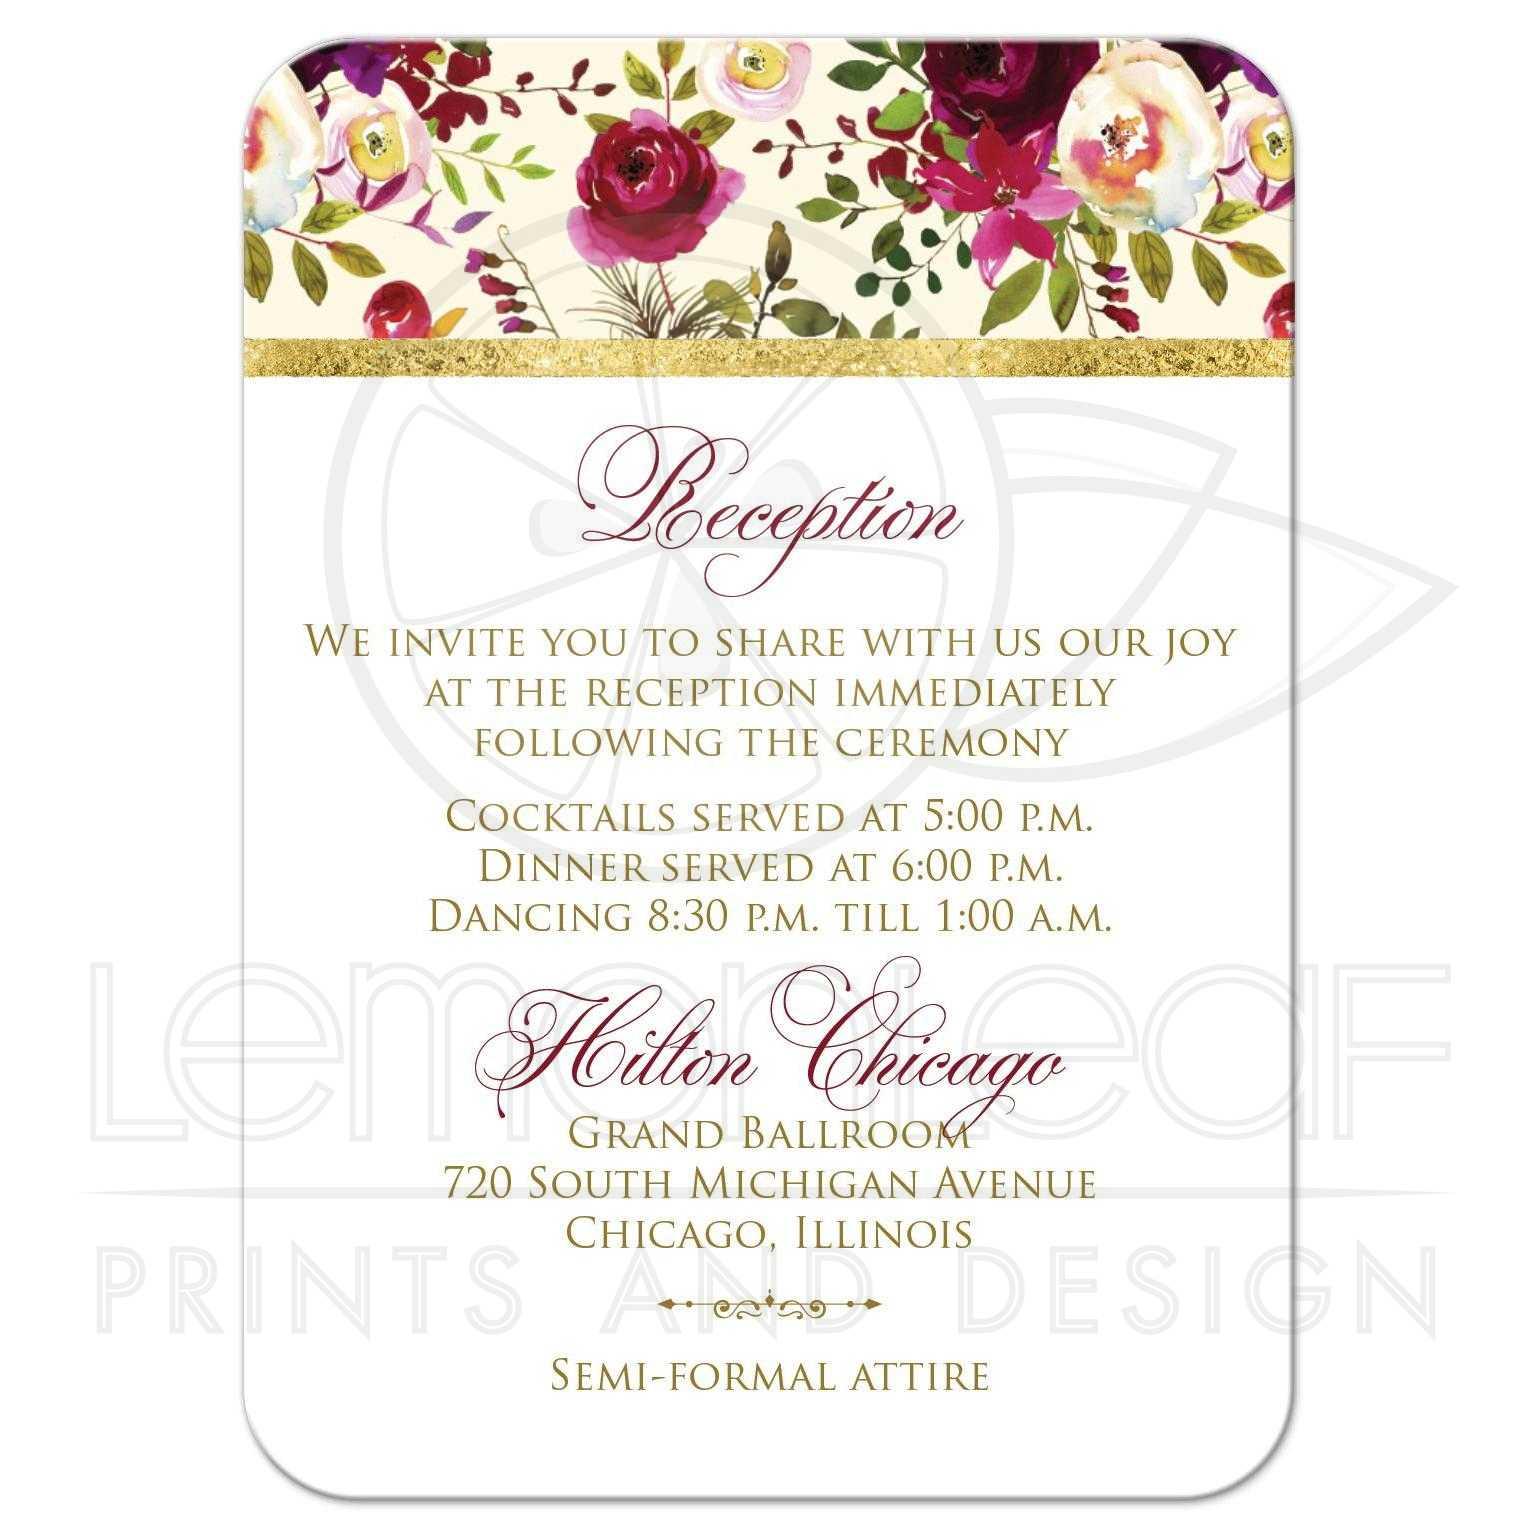 Personalized Graduation Open House Invitations